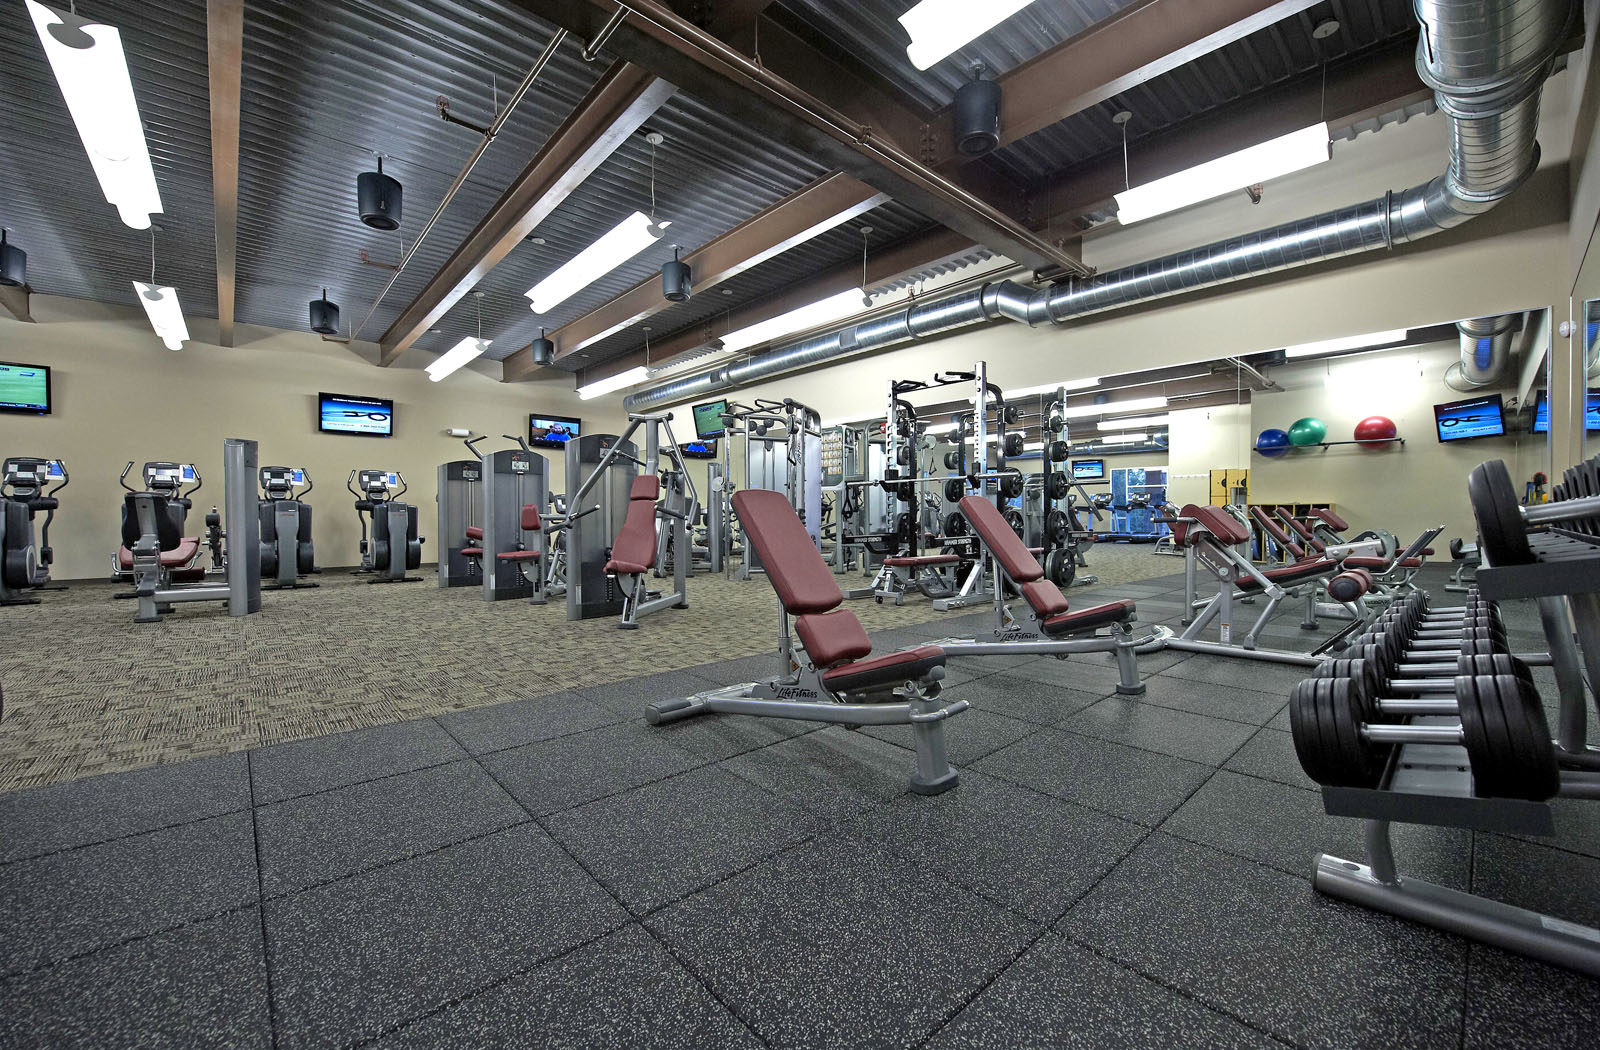 anderson_farm_park_gym_2